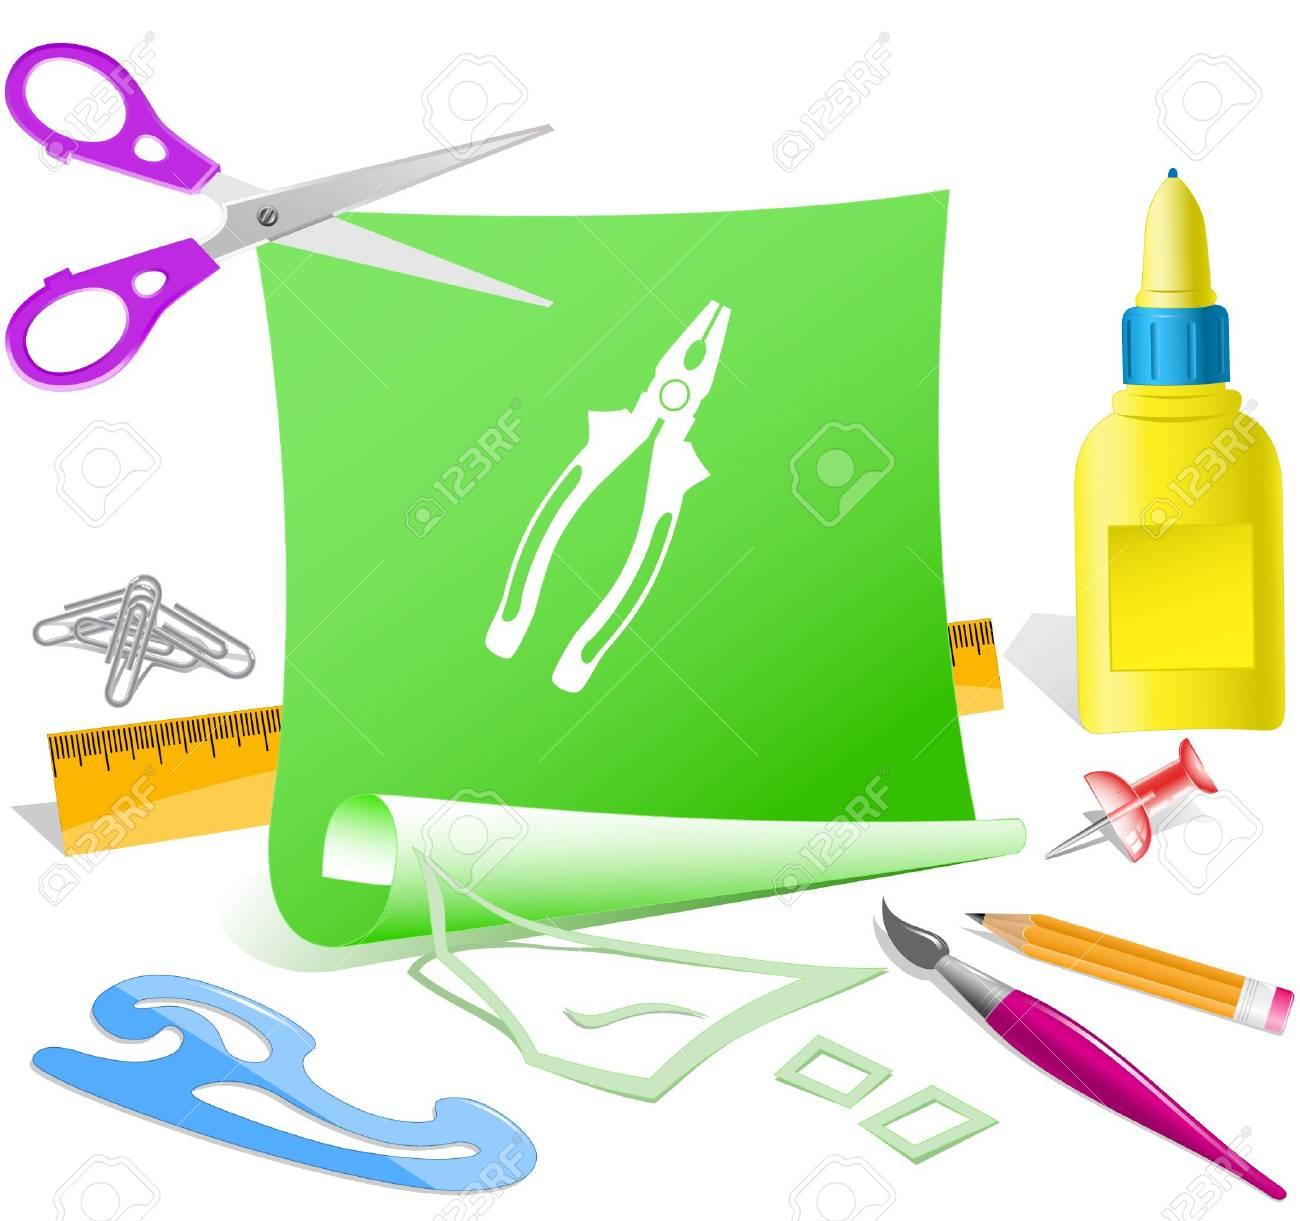 Combination pliers. Vector paper template. Stock Vector - 6846635